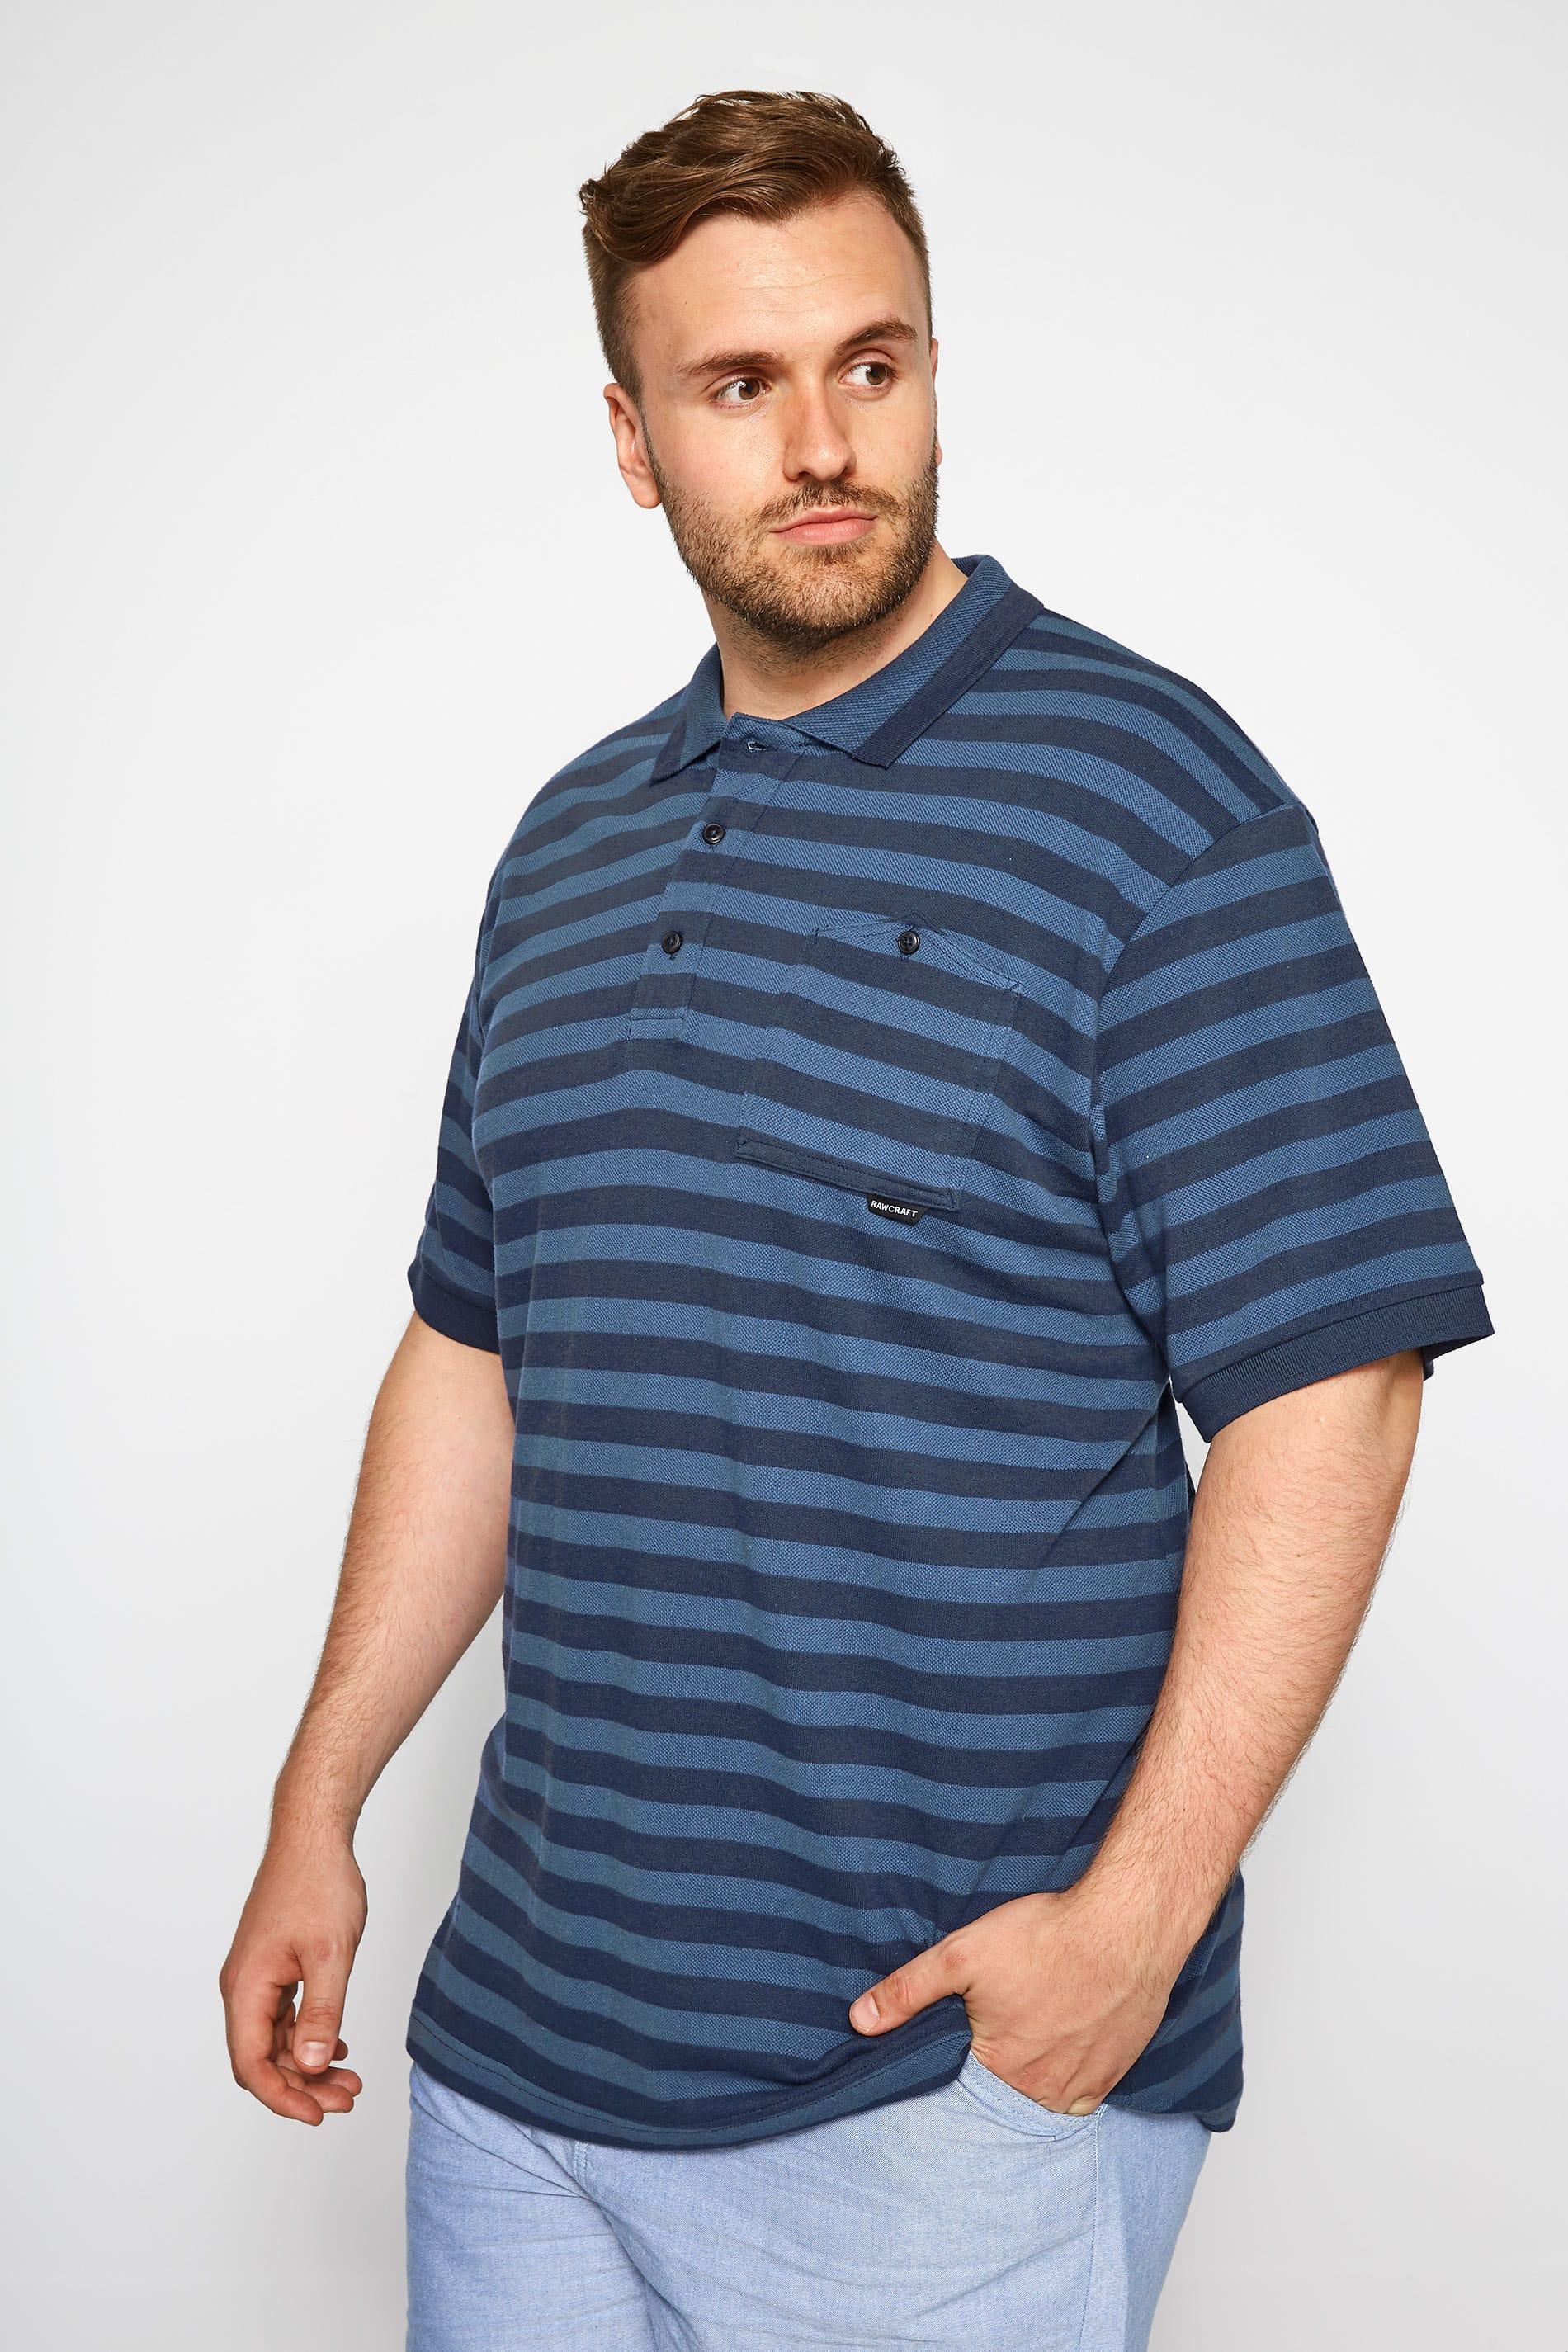 RAWCRAFT Blue Striped Polo Shirt